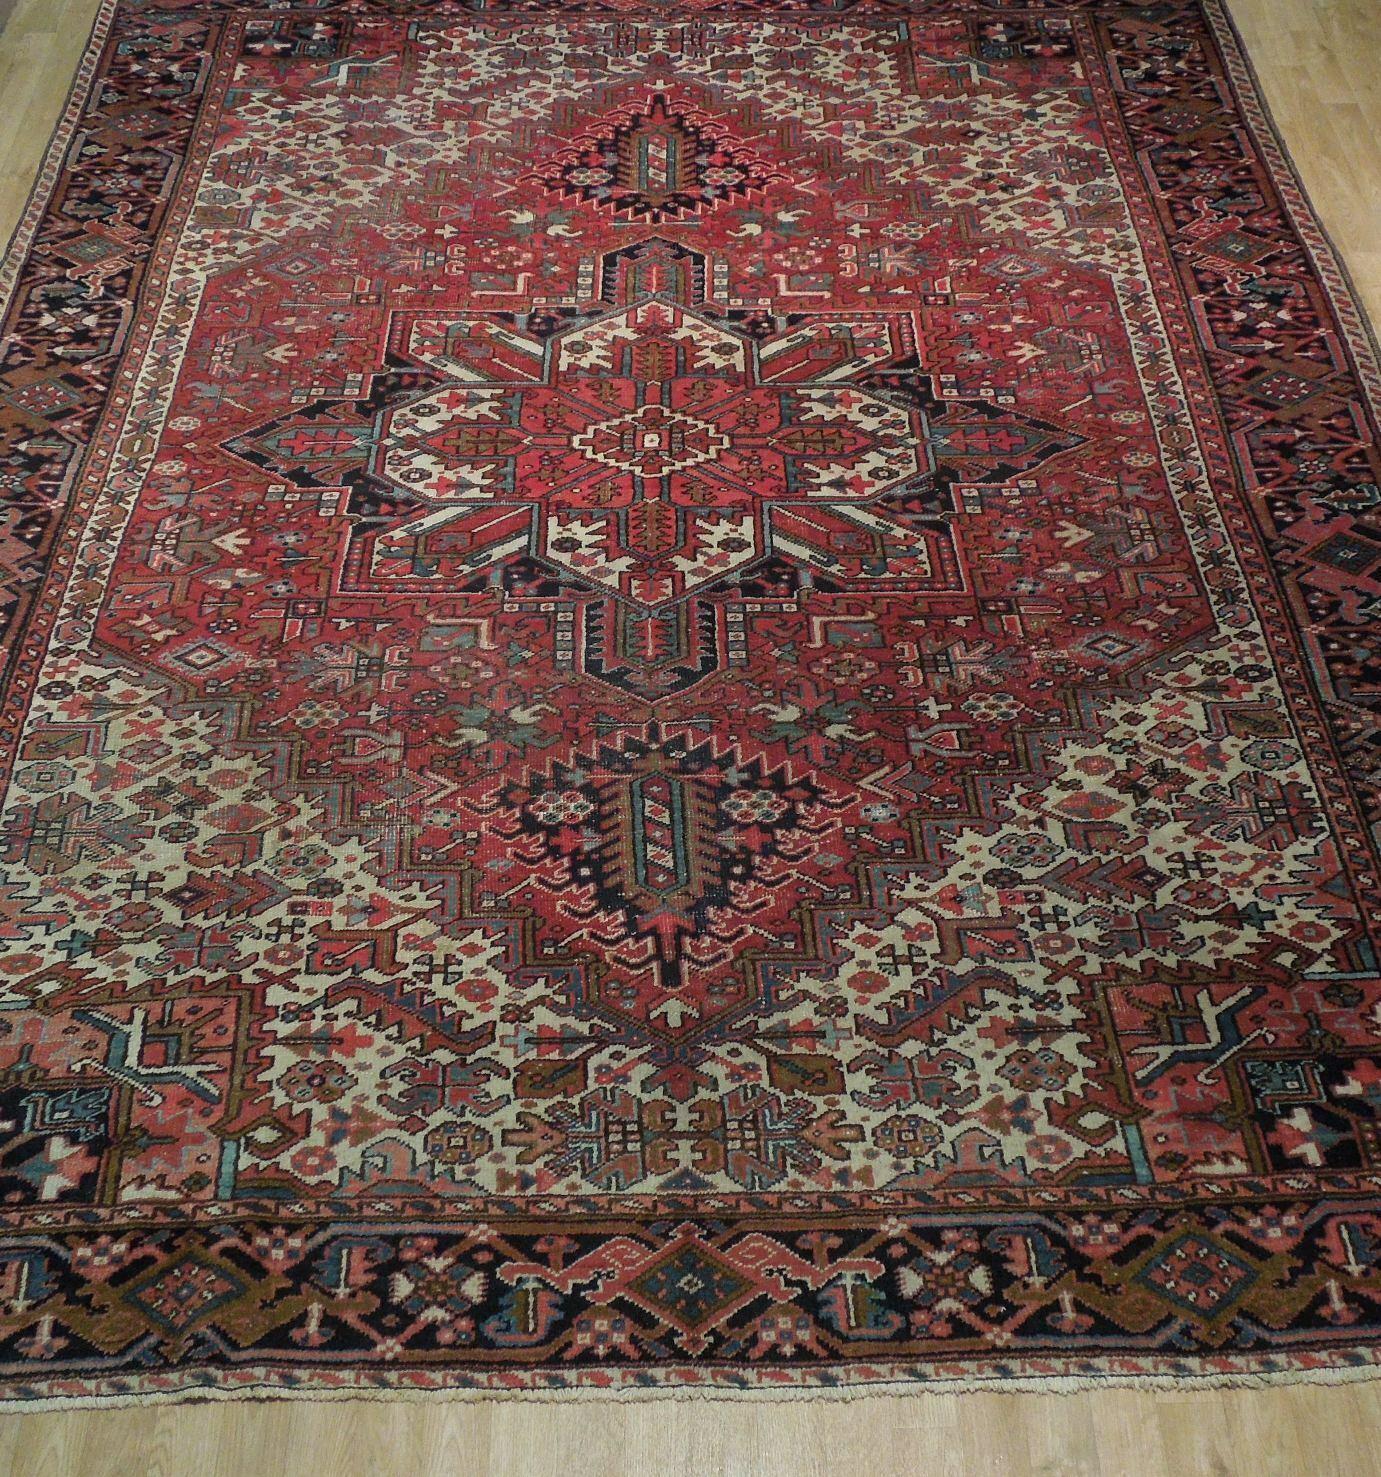 Normal Wear Semi-Antique Persian Handmade 9x12 Burgundy Heriz Wool Rug image 10